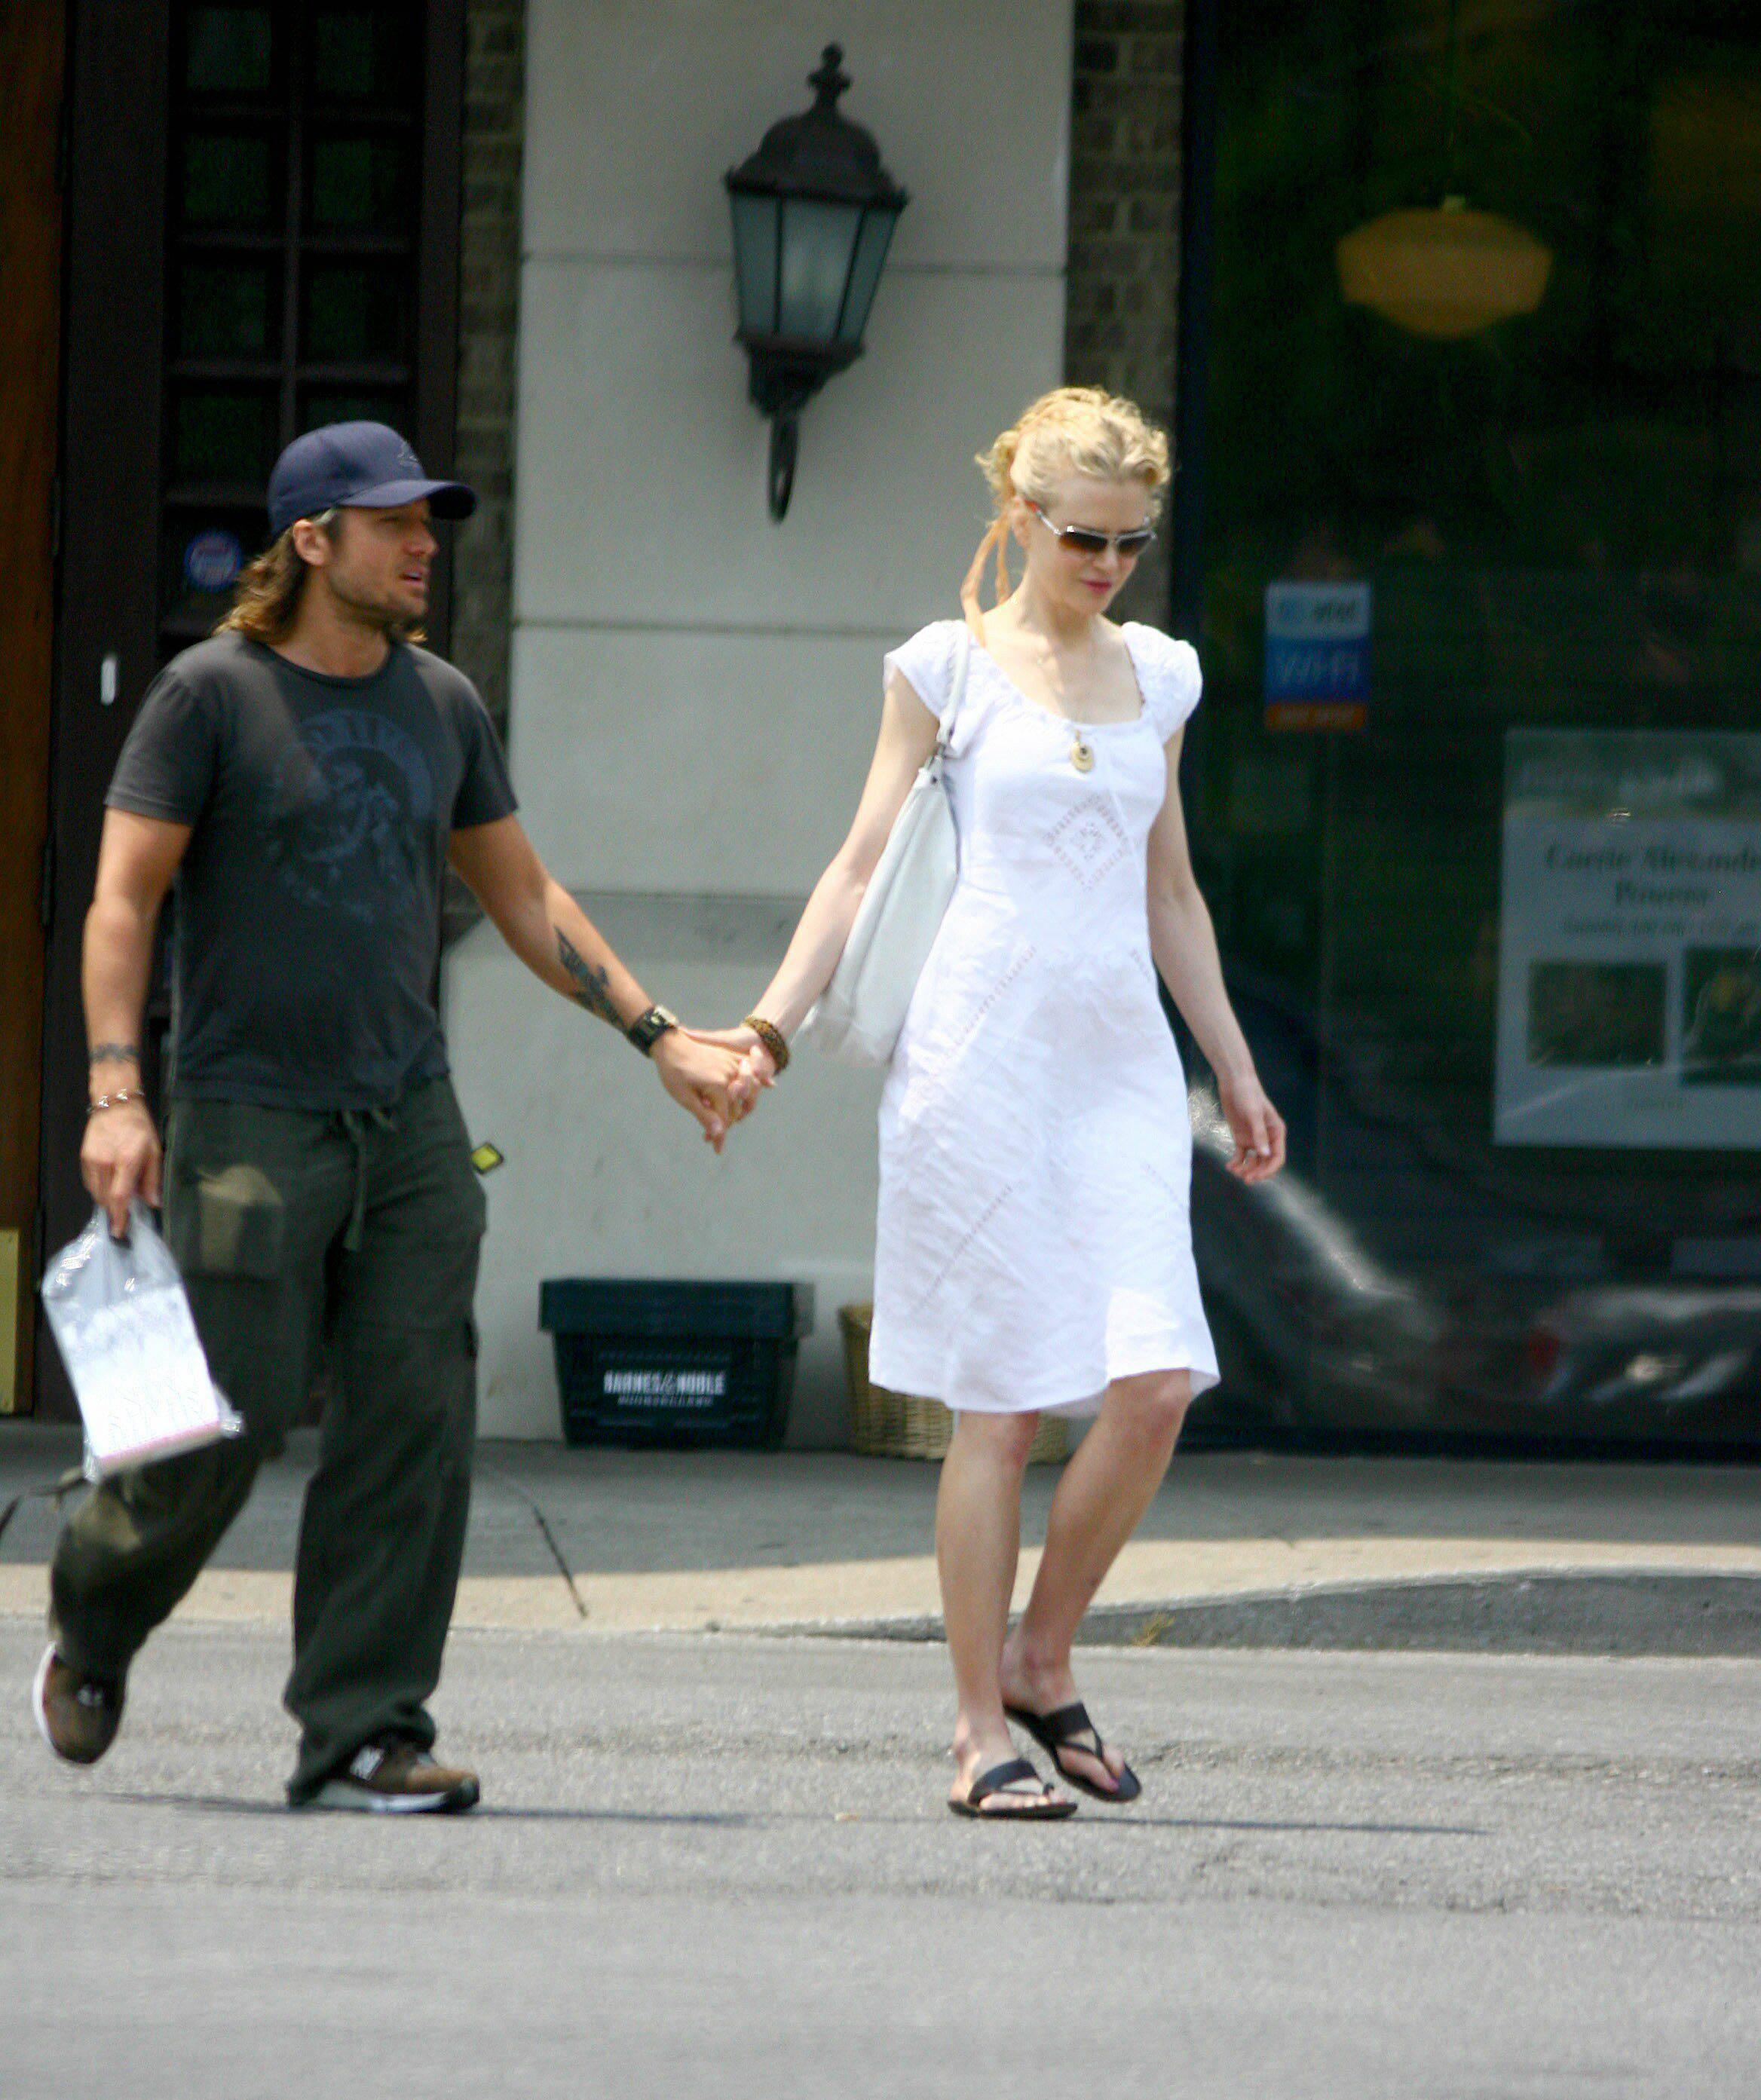 25952_Nicole_Kidman_and_Keith_Urban_buy_a_book_in_Nashville_07_494lo.jpg